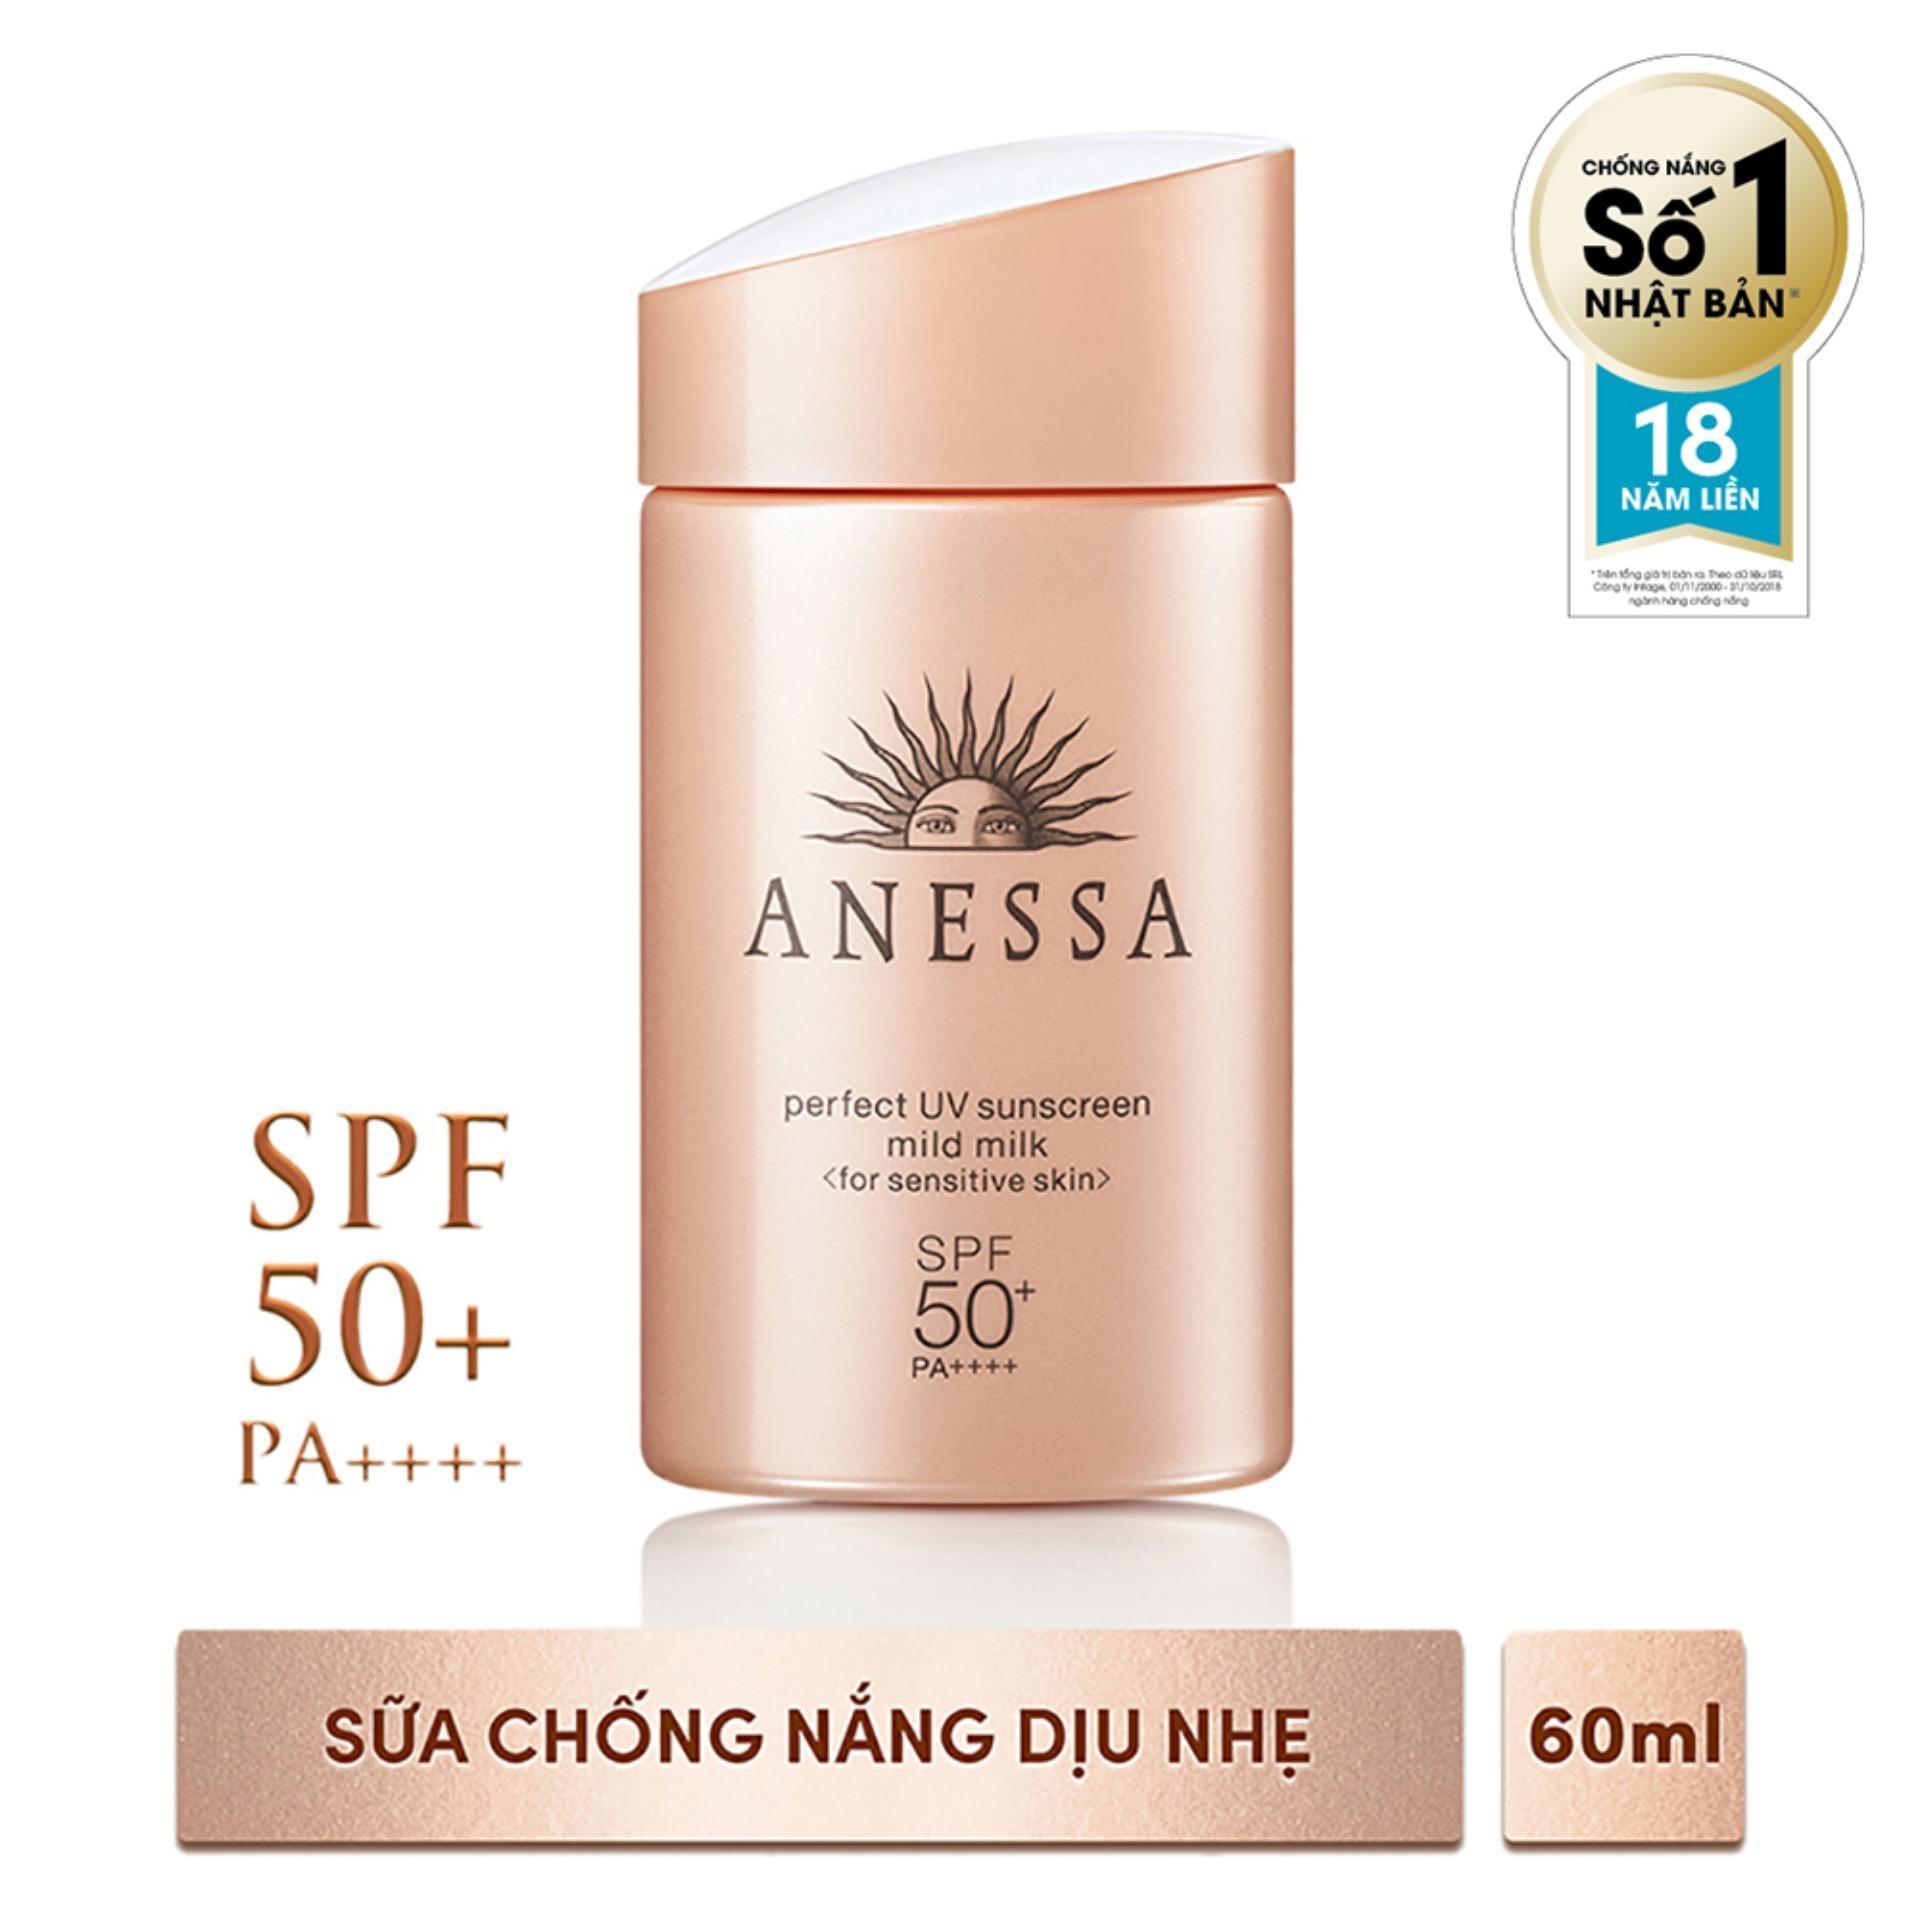 Anessa Perfect UV Sunscreen Mild Milk SPF50+ PA++++